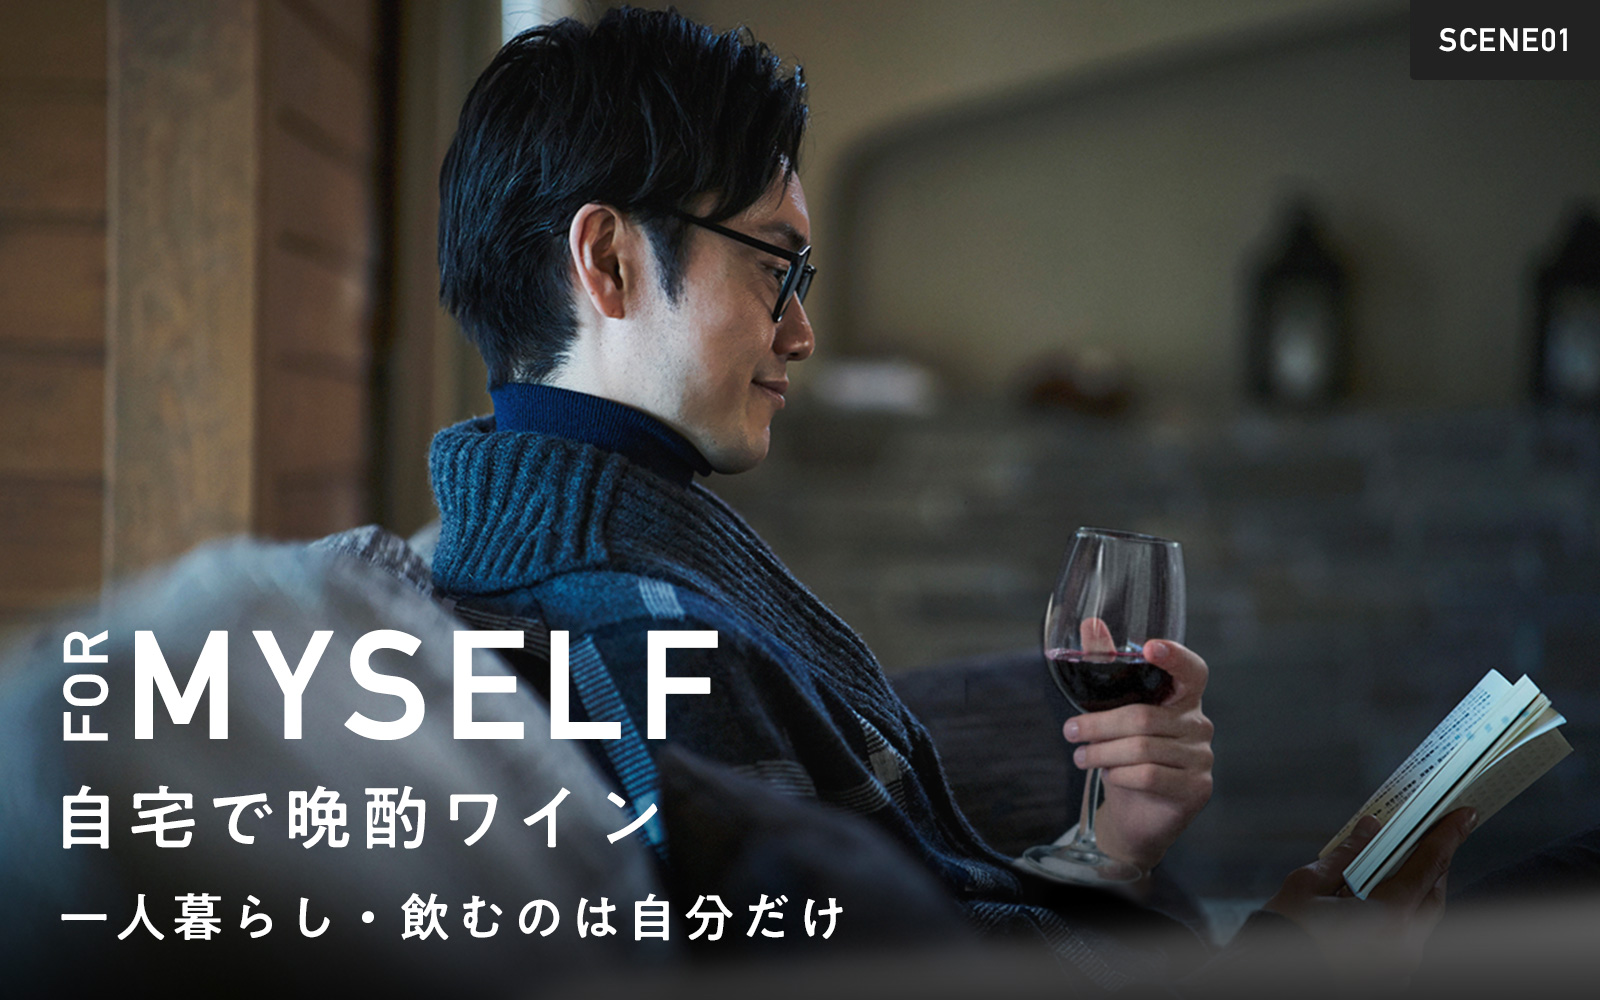 SCENE 01 自宅で晩酌ワイン一人暮らし・飲むのは自分だけ